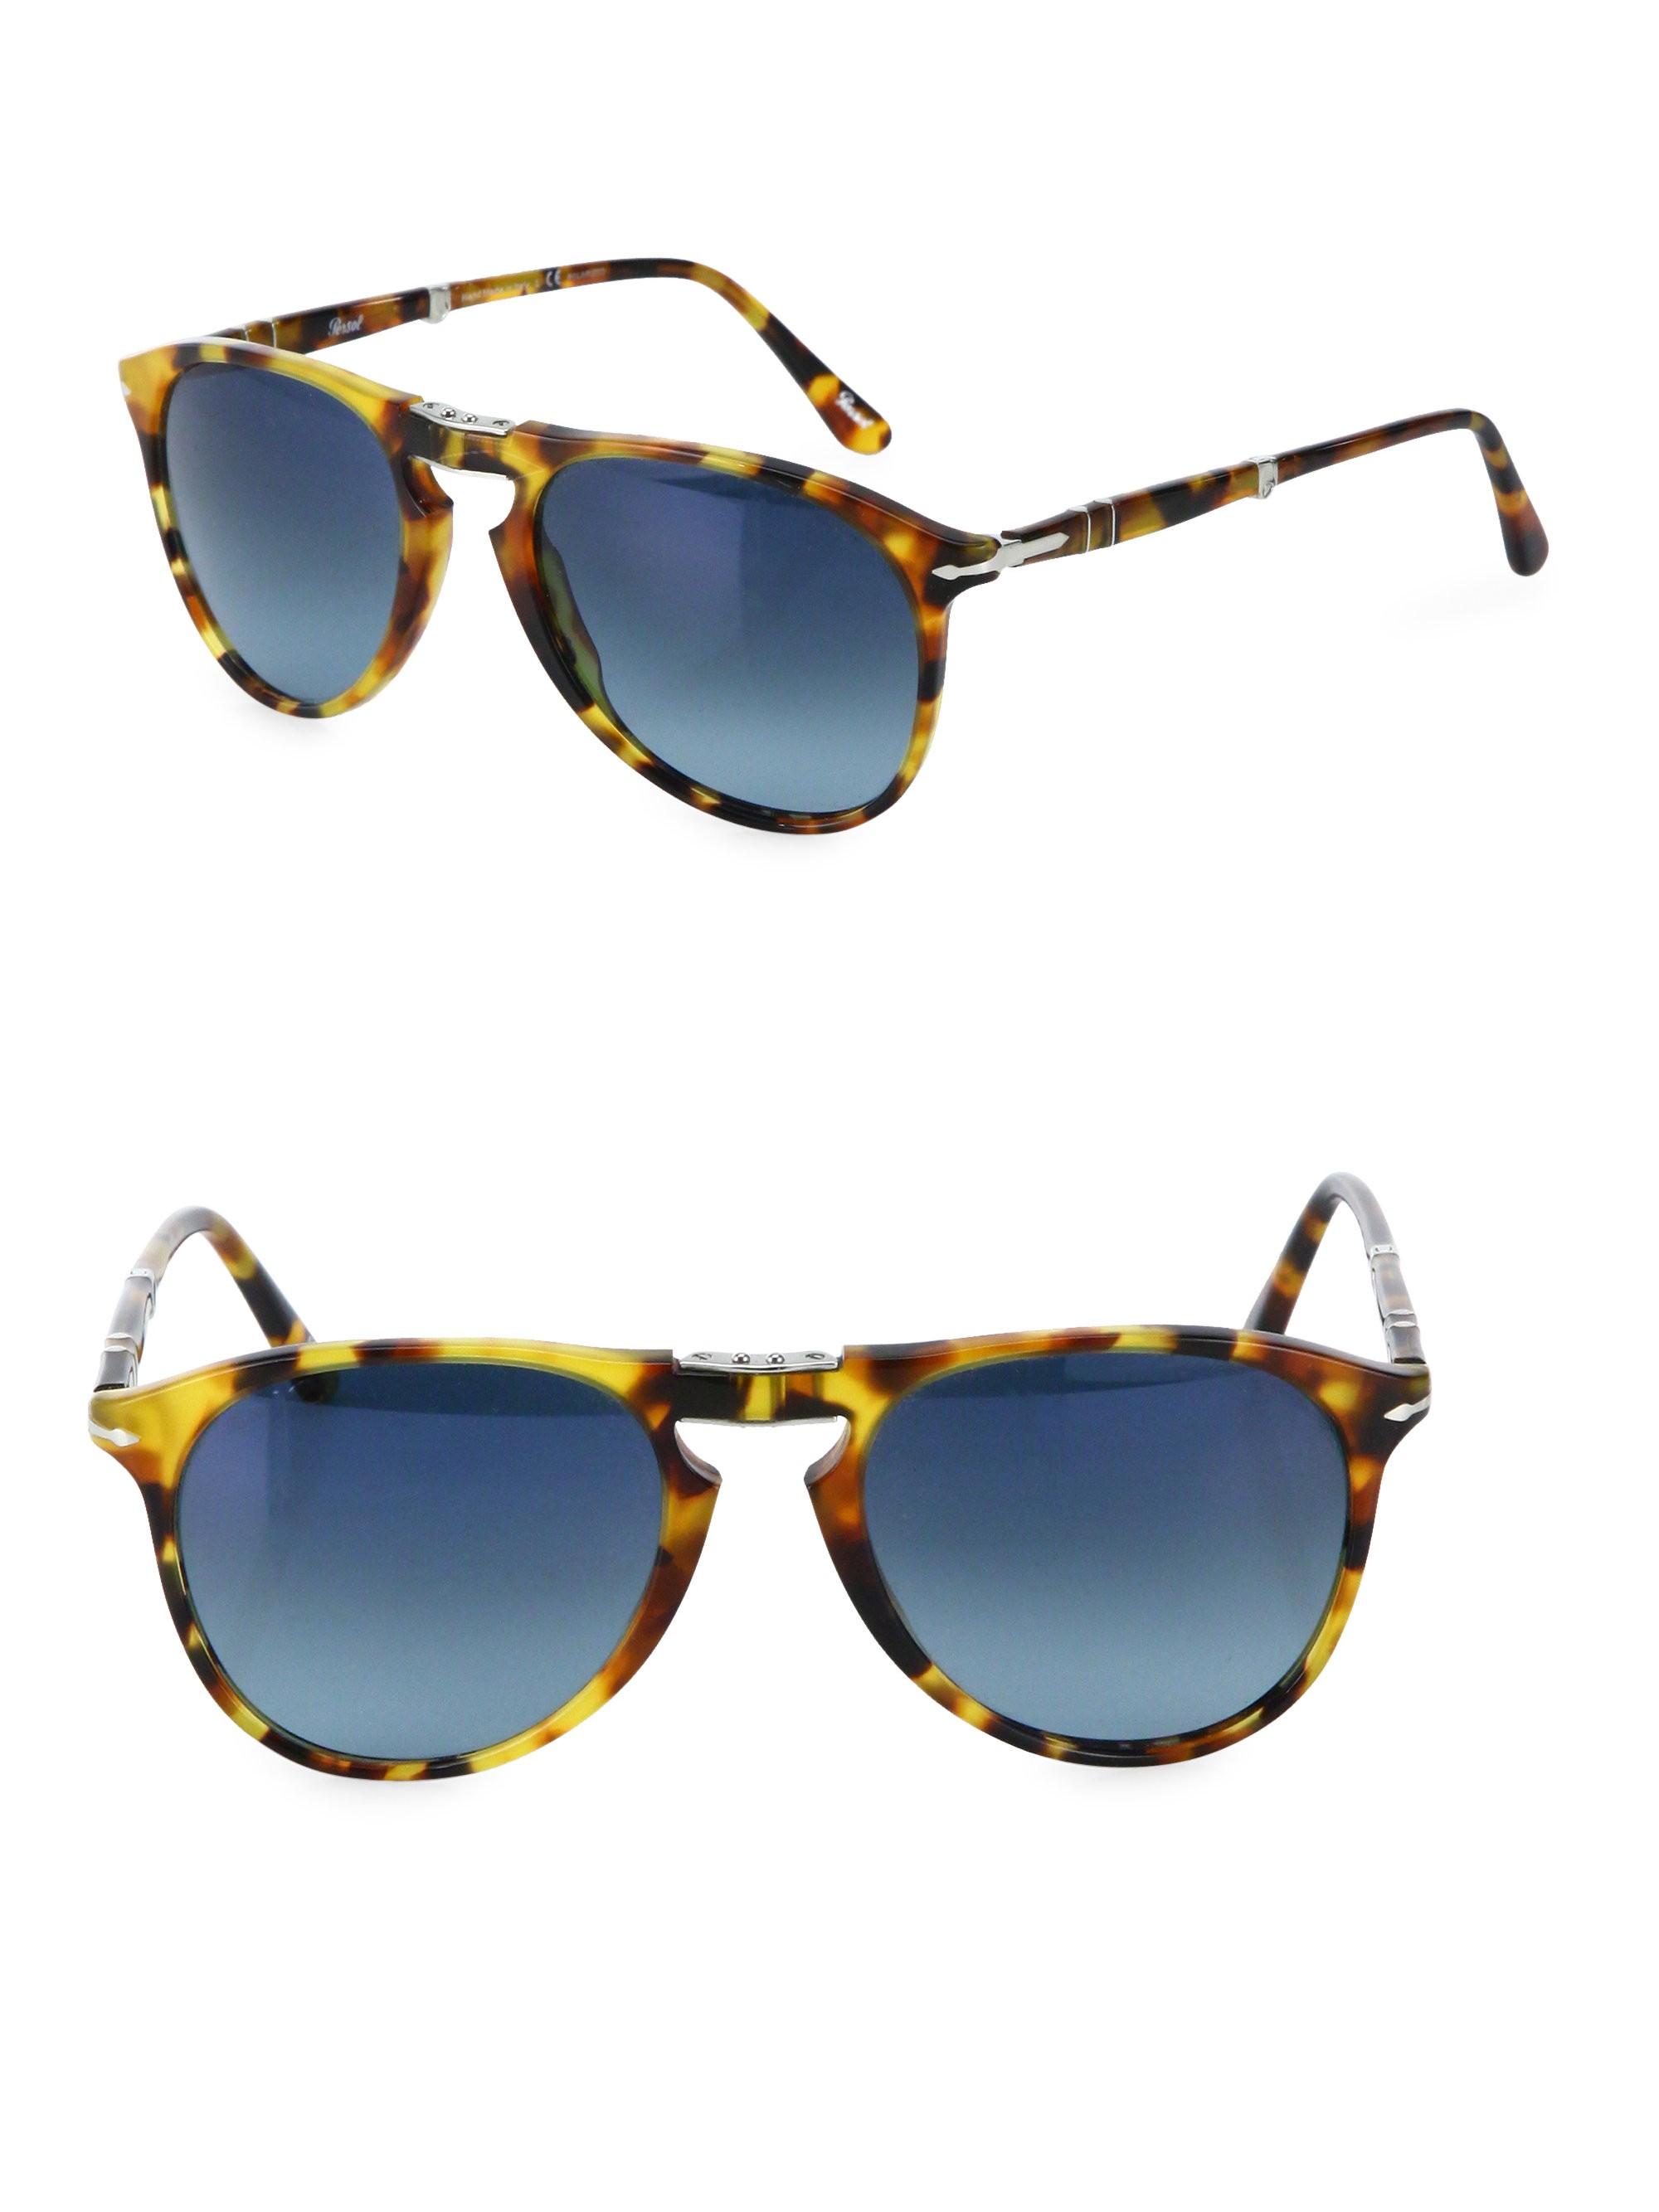 2c39fc844eead Persol 55Mm Pilot Sunglasses - Blue Grapol One Size